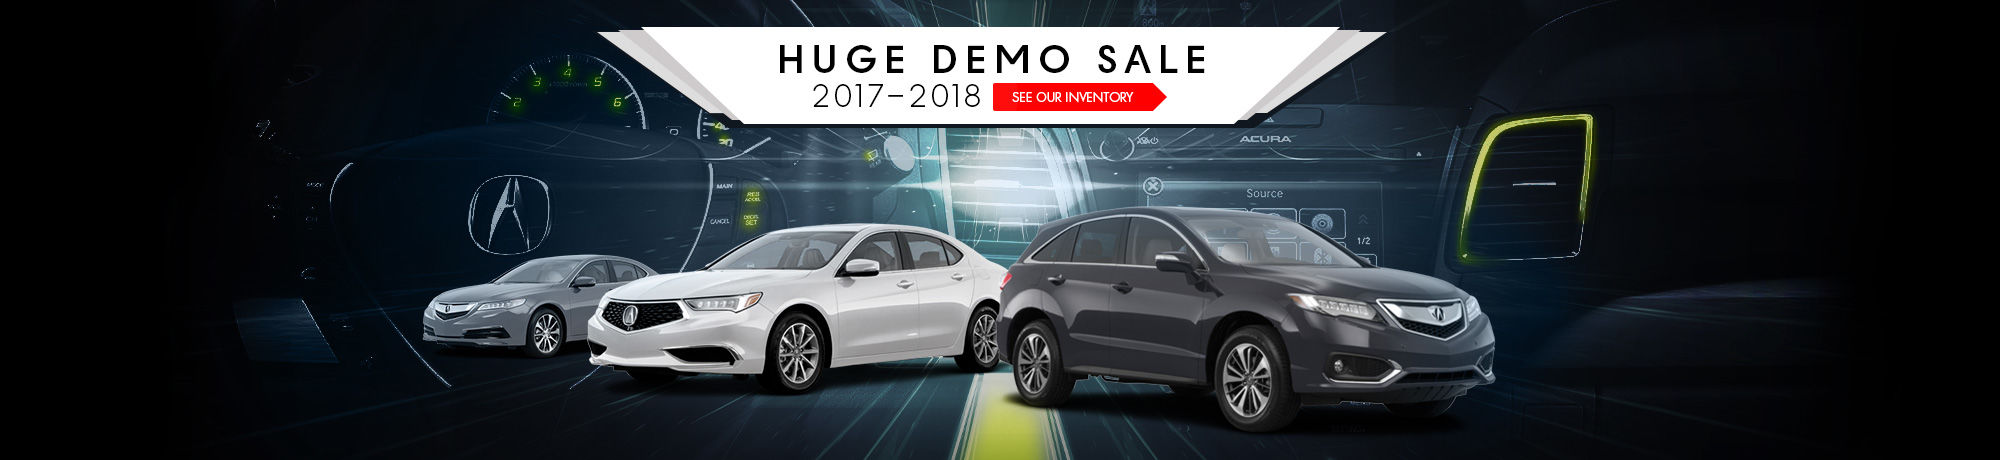 Huge Demo Sale